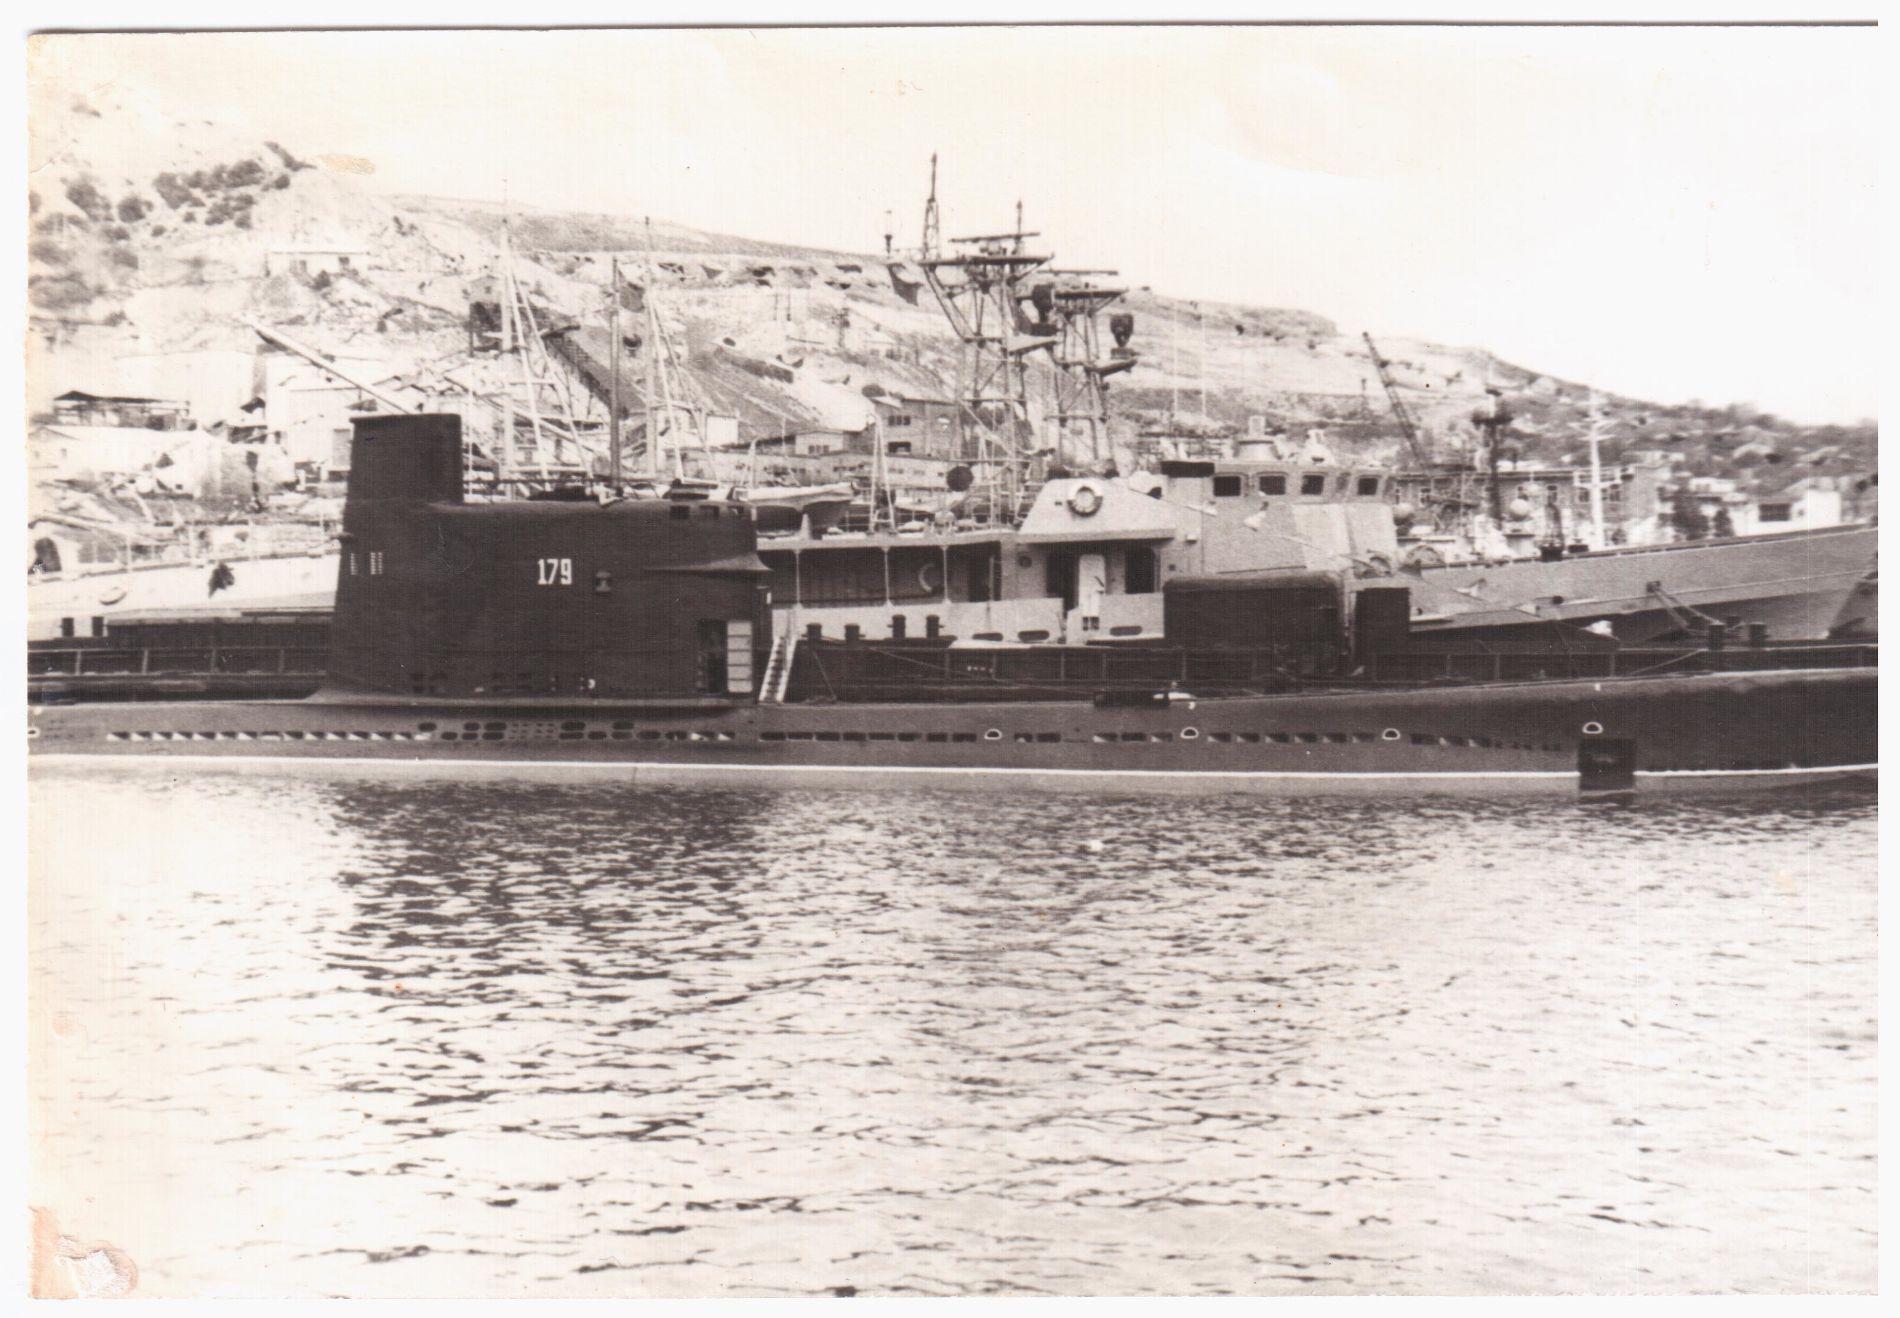 ПЛ М-261 в Балаклавской бухте, 1970-е годы ©Фото с сайта forums.airbase.ru